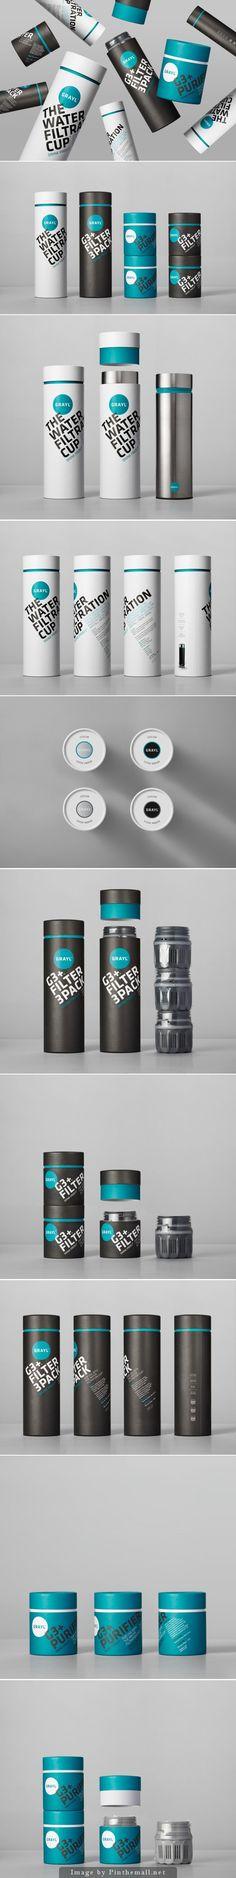 Best Packaging Design on the Internet, Grayl Water Filtration Cup #packagingdesign #packaging #design